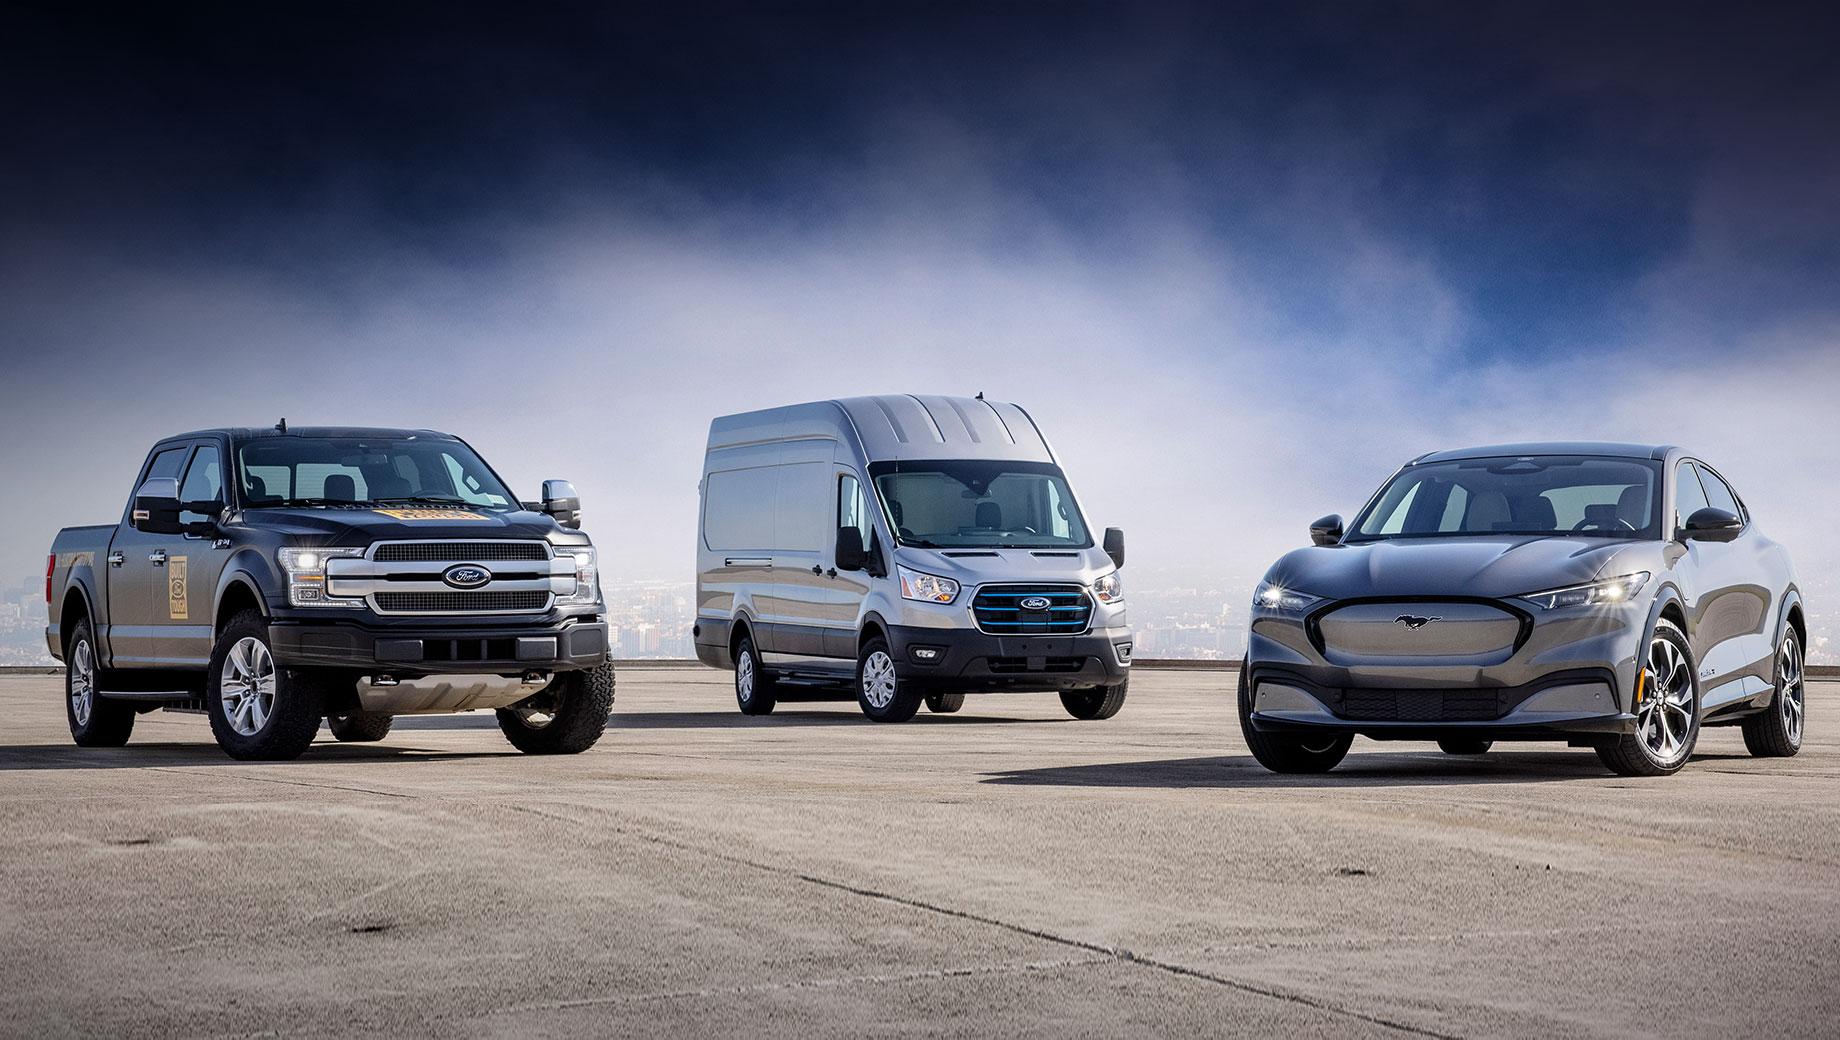 Ford электрифицирует все легковушки в Европе с 2026 года